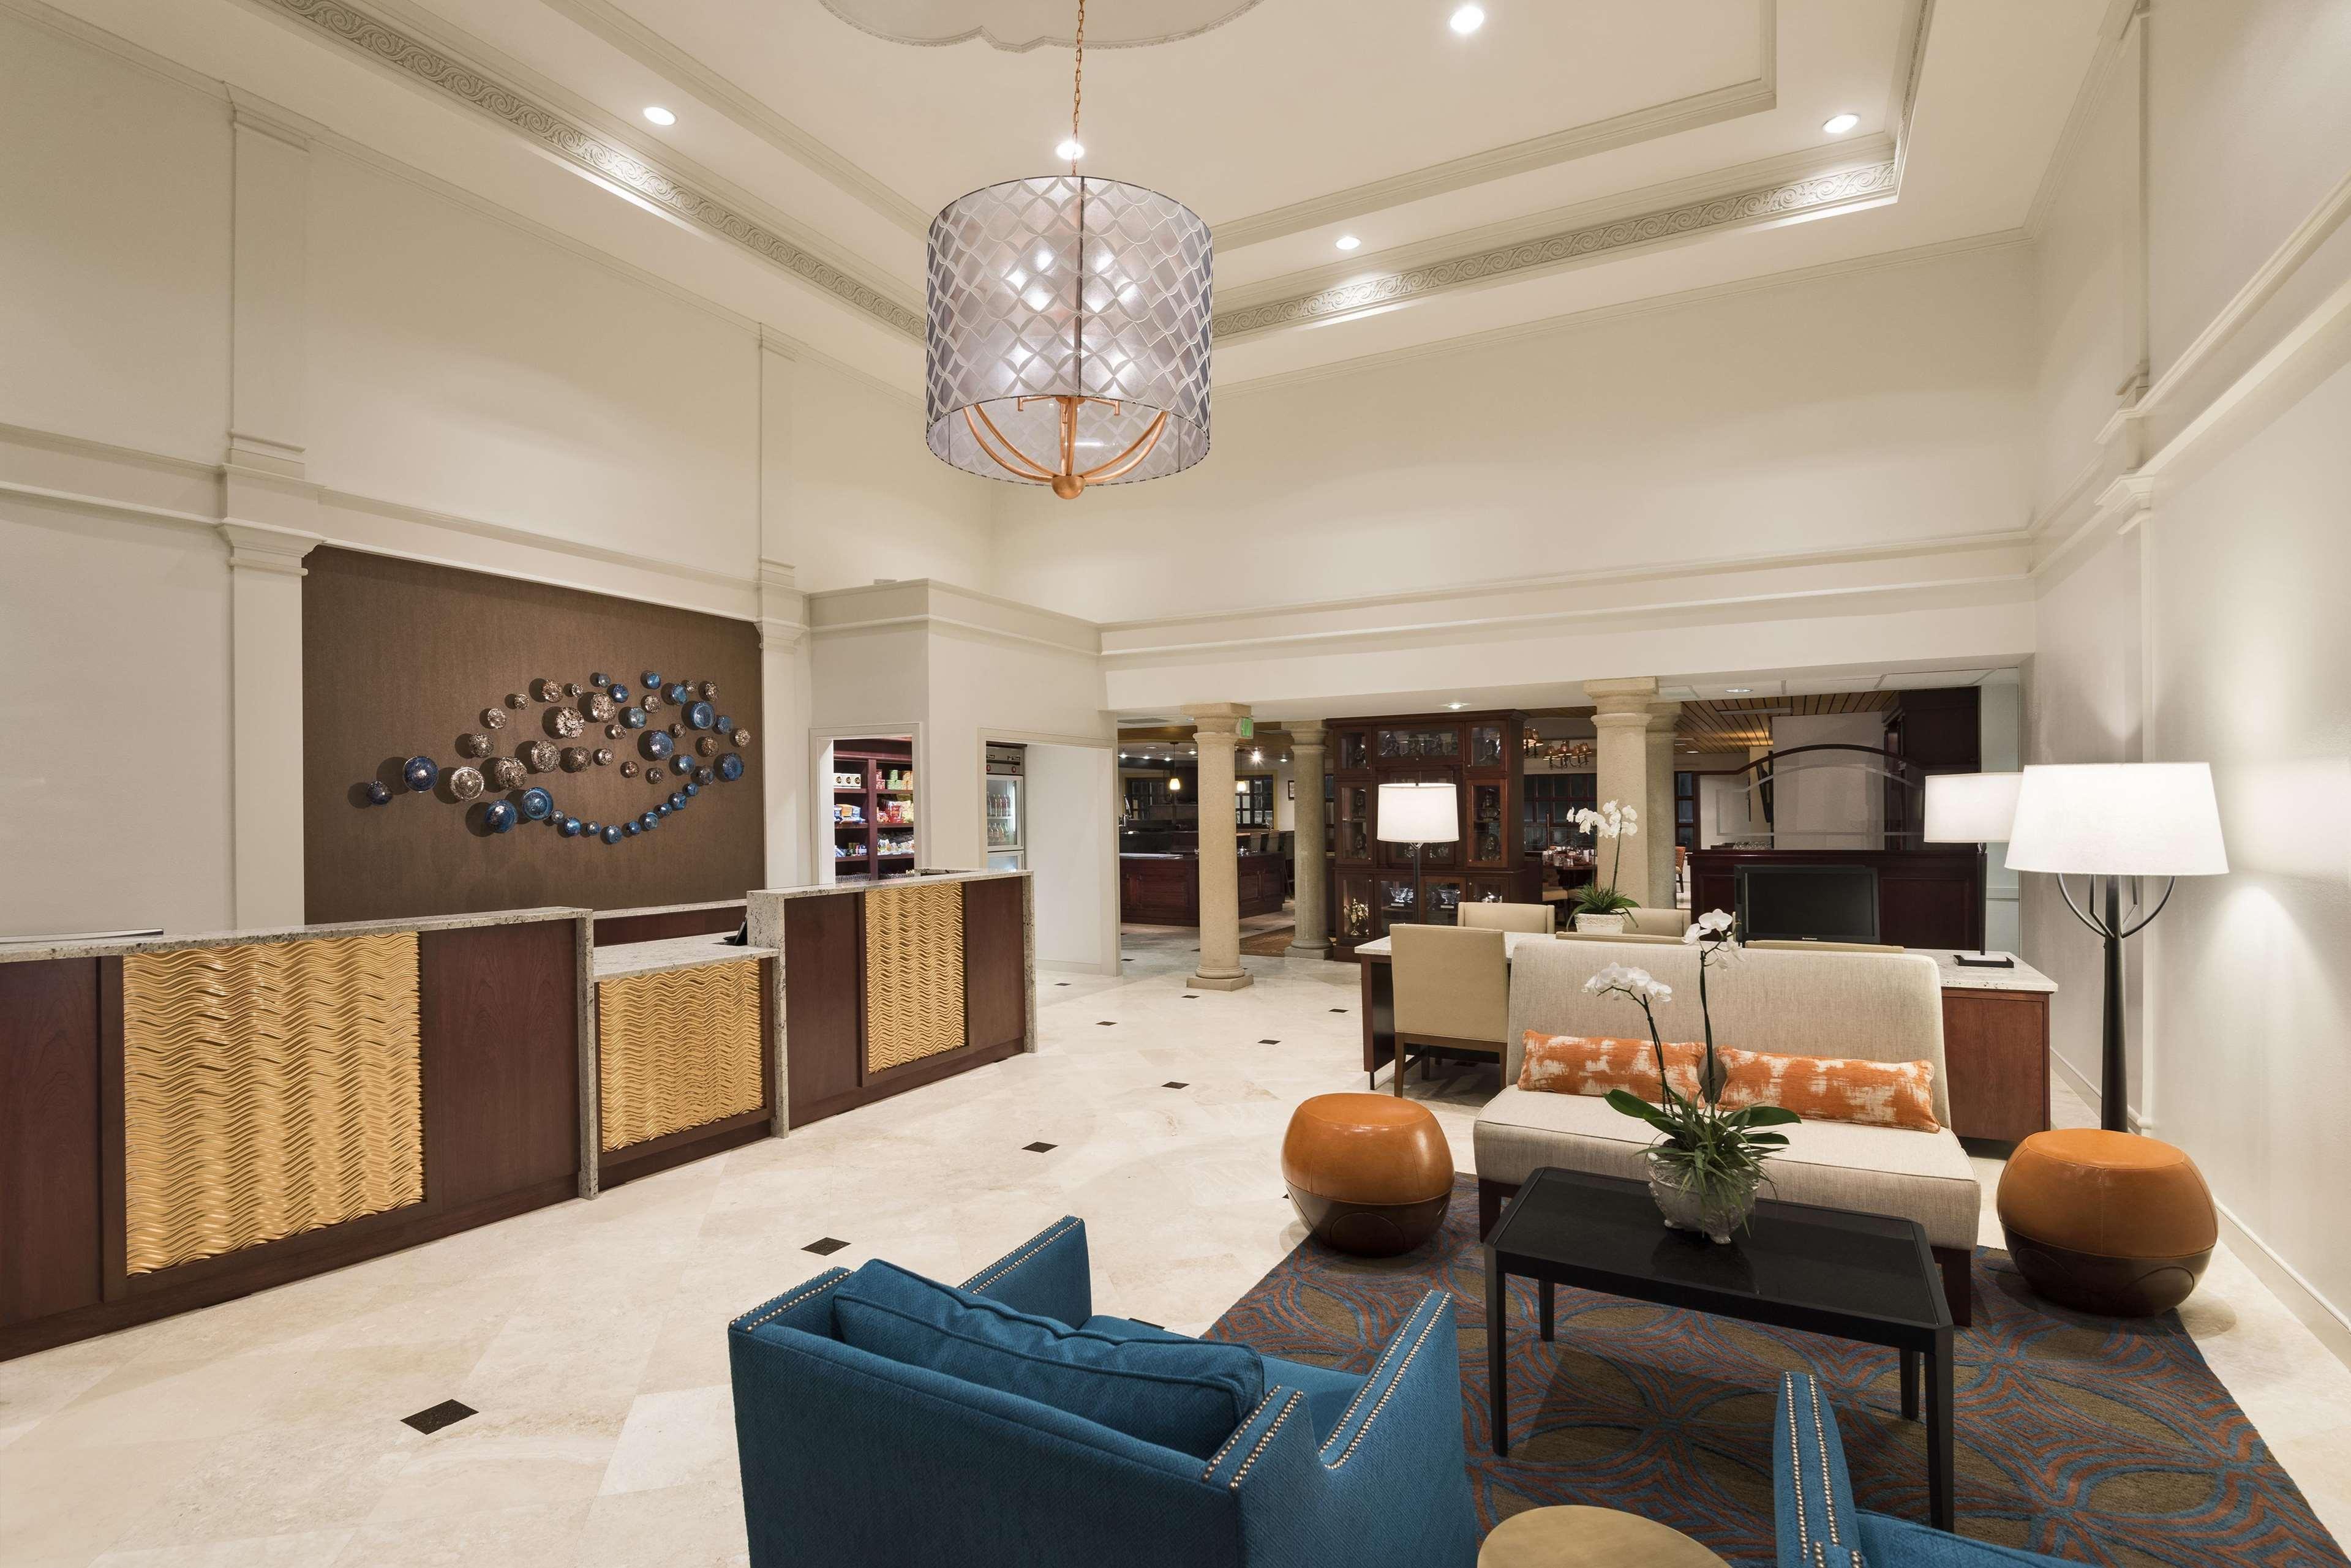 DoubleTree Suites by Hilton Hotel Naples image 5